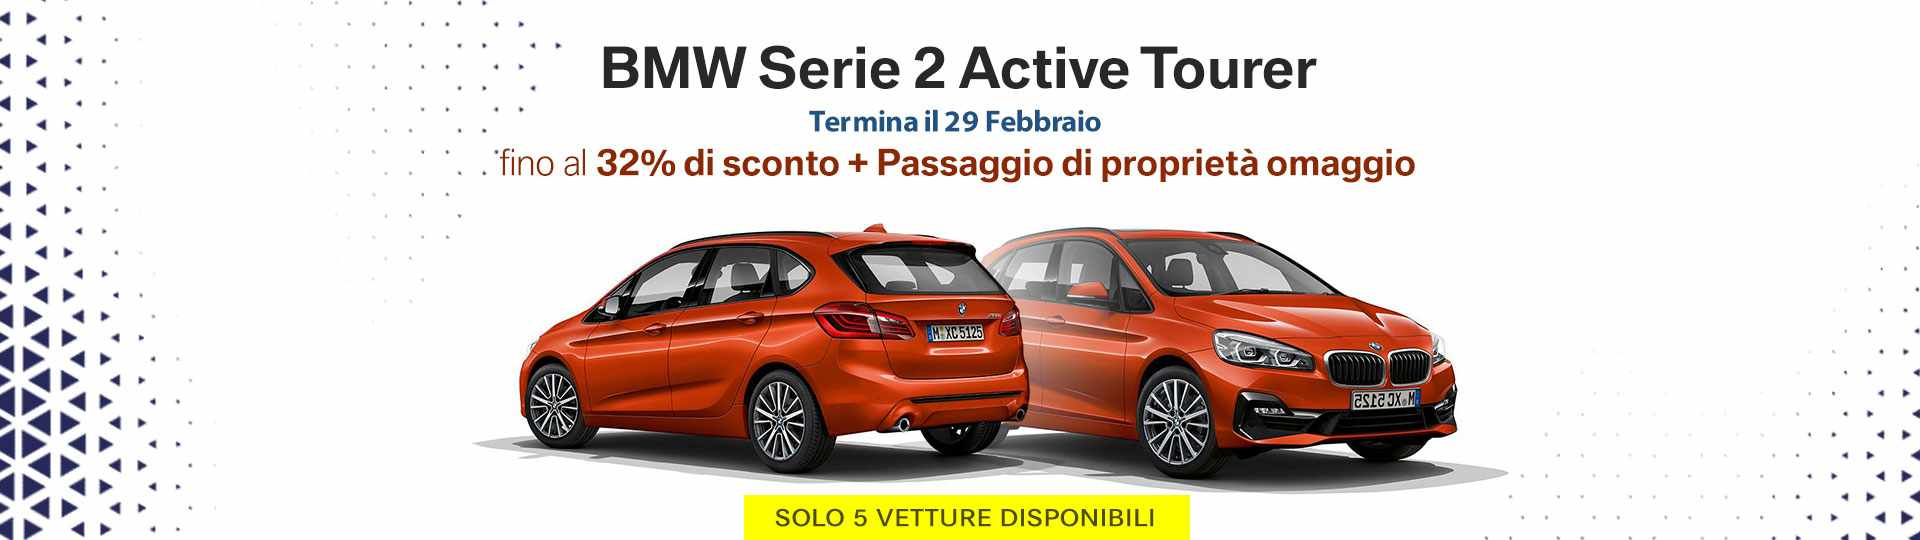 header_campagne_febbraio_bmw_serie_2_at_22.jpg